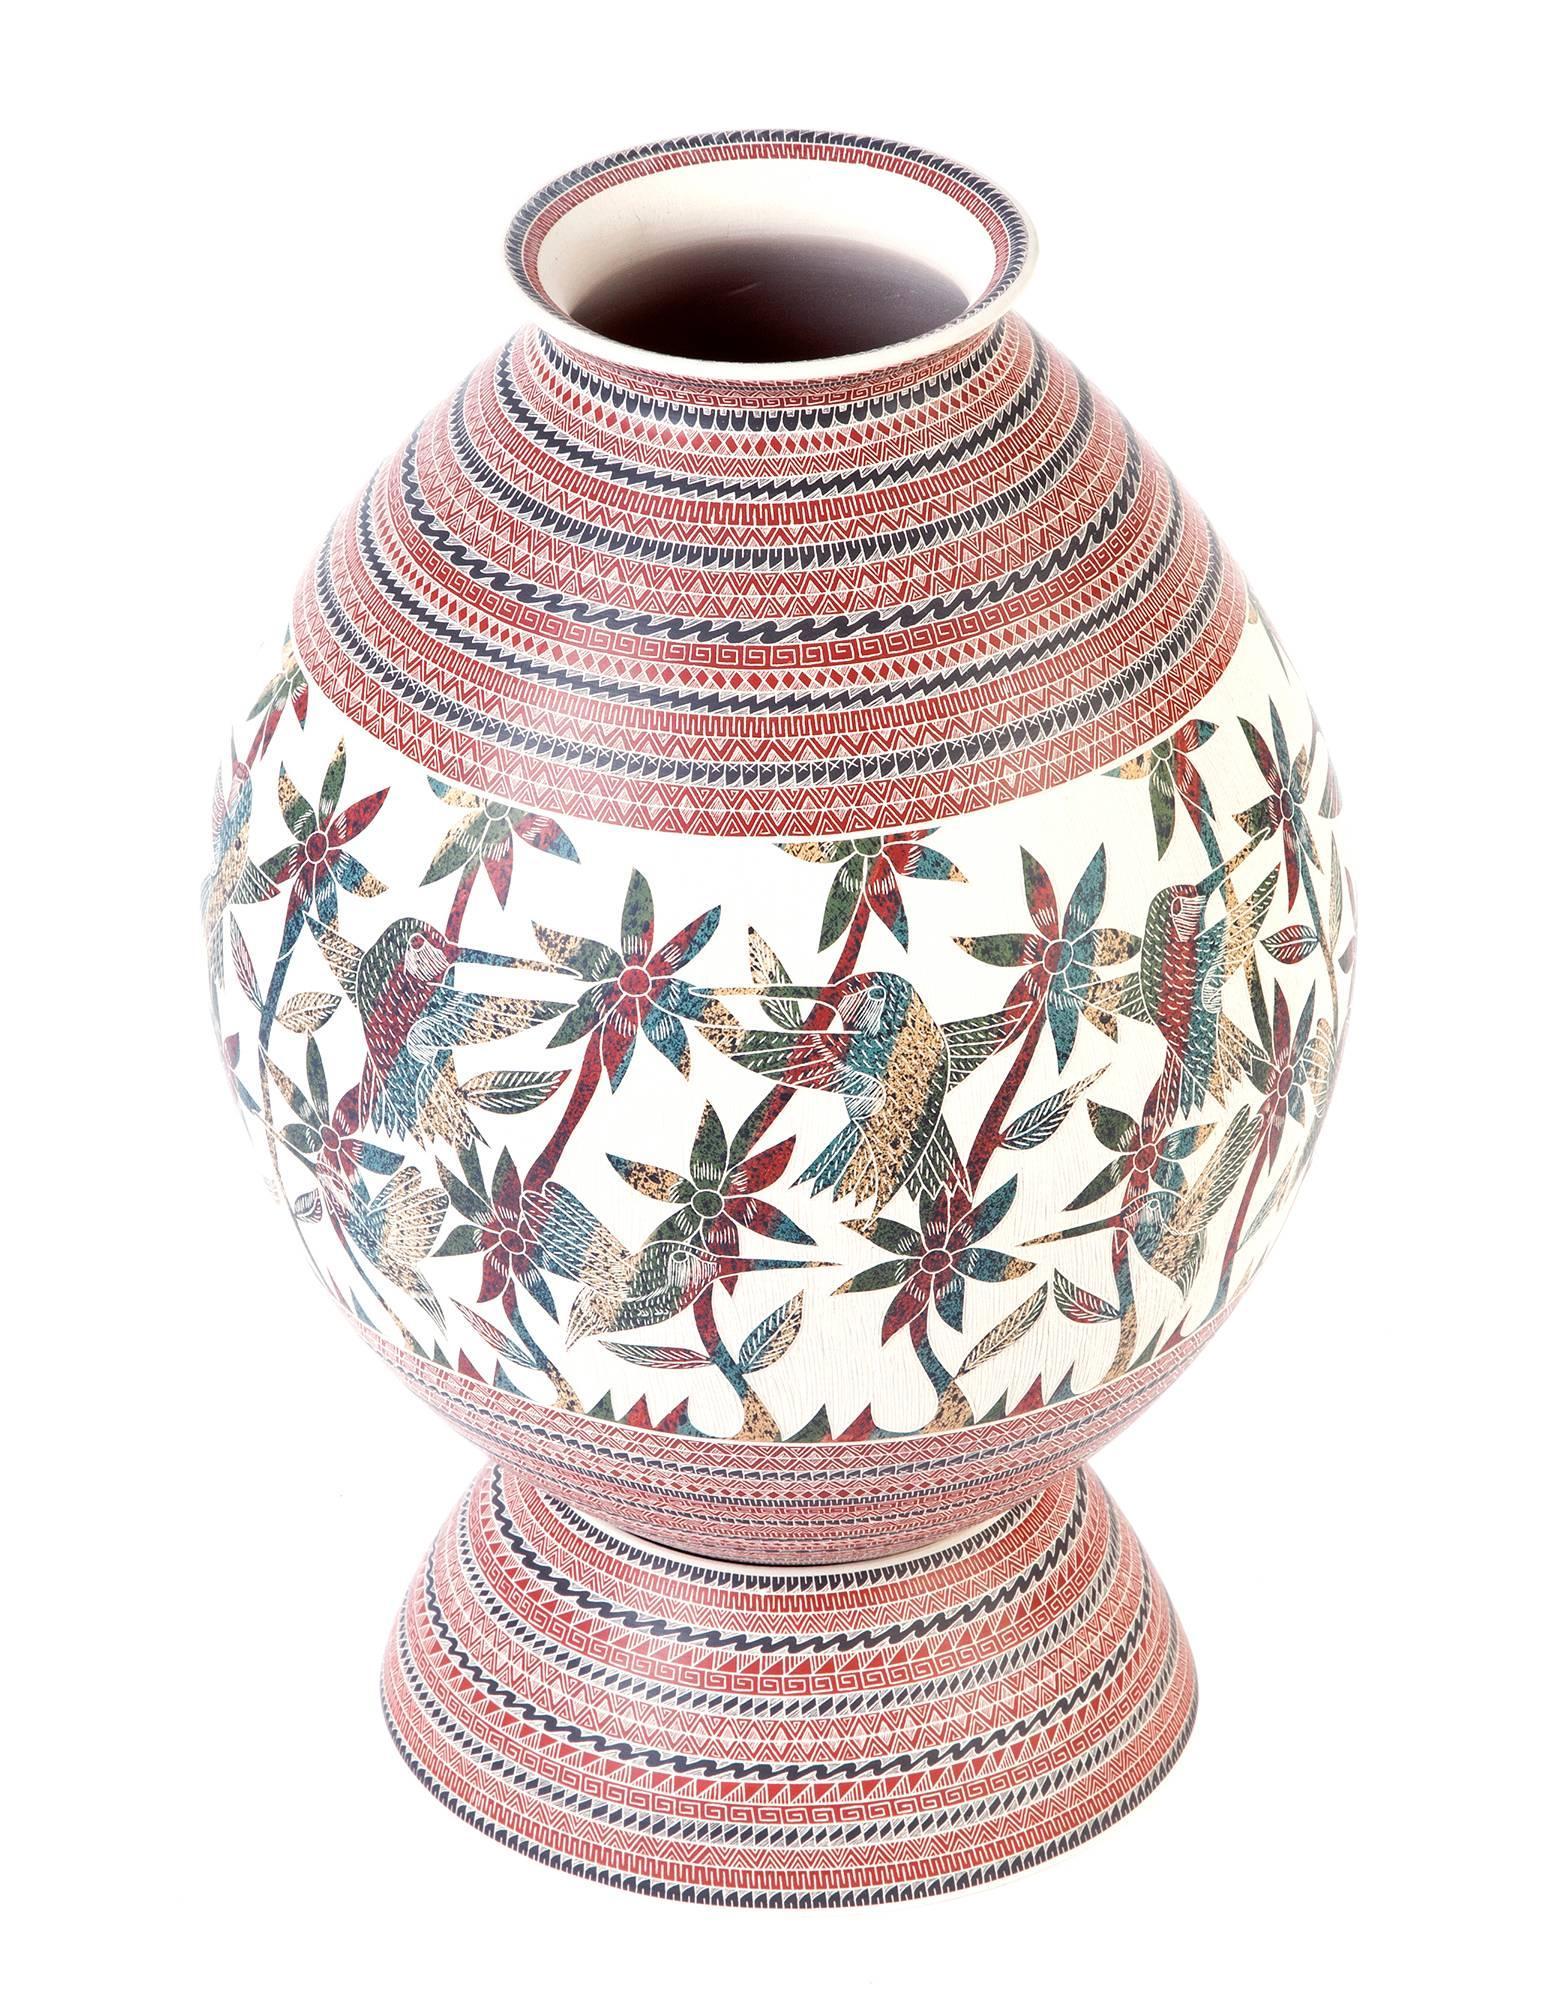 8'' Vasija Multicolor / Ceramic Mexican Folk Art from Mata Ortiz